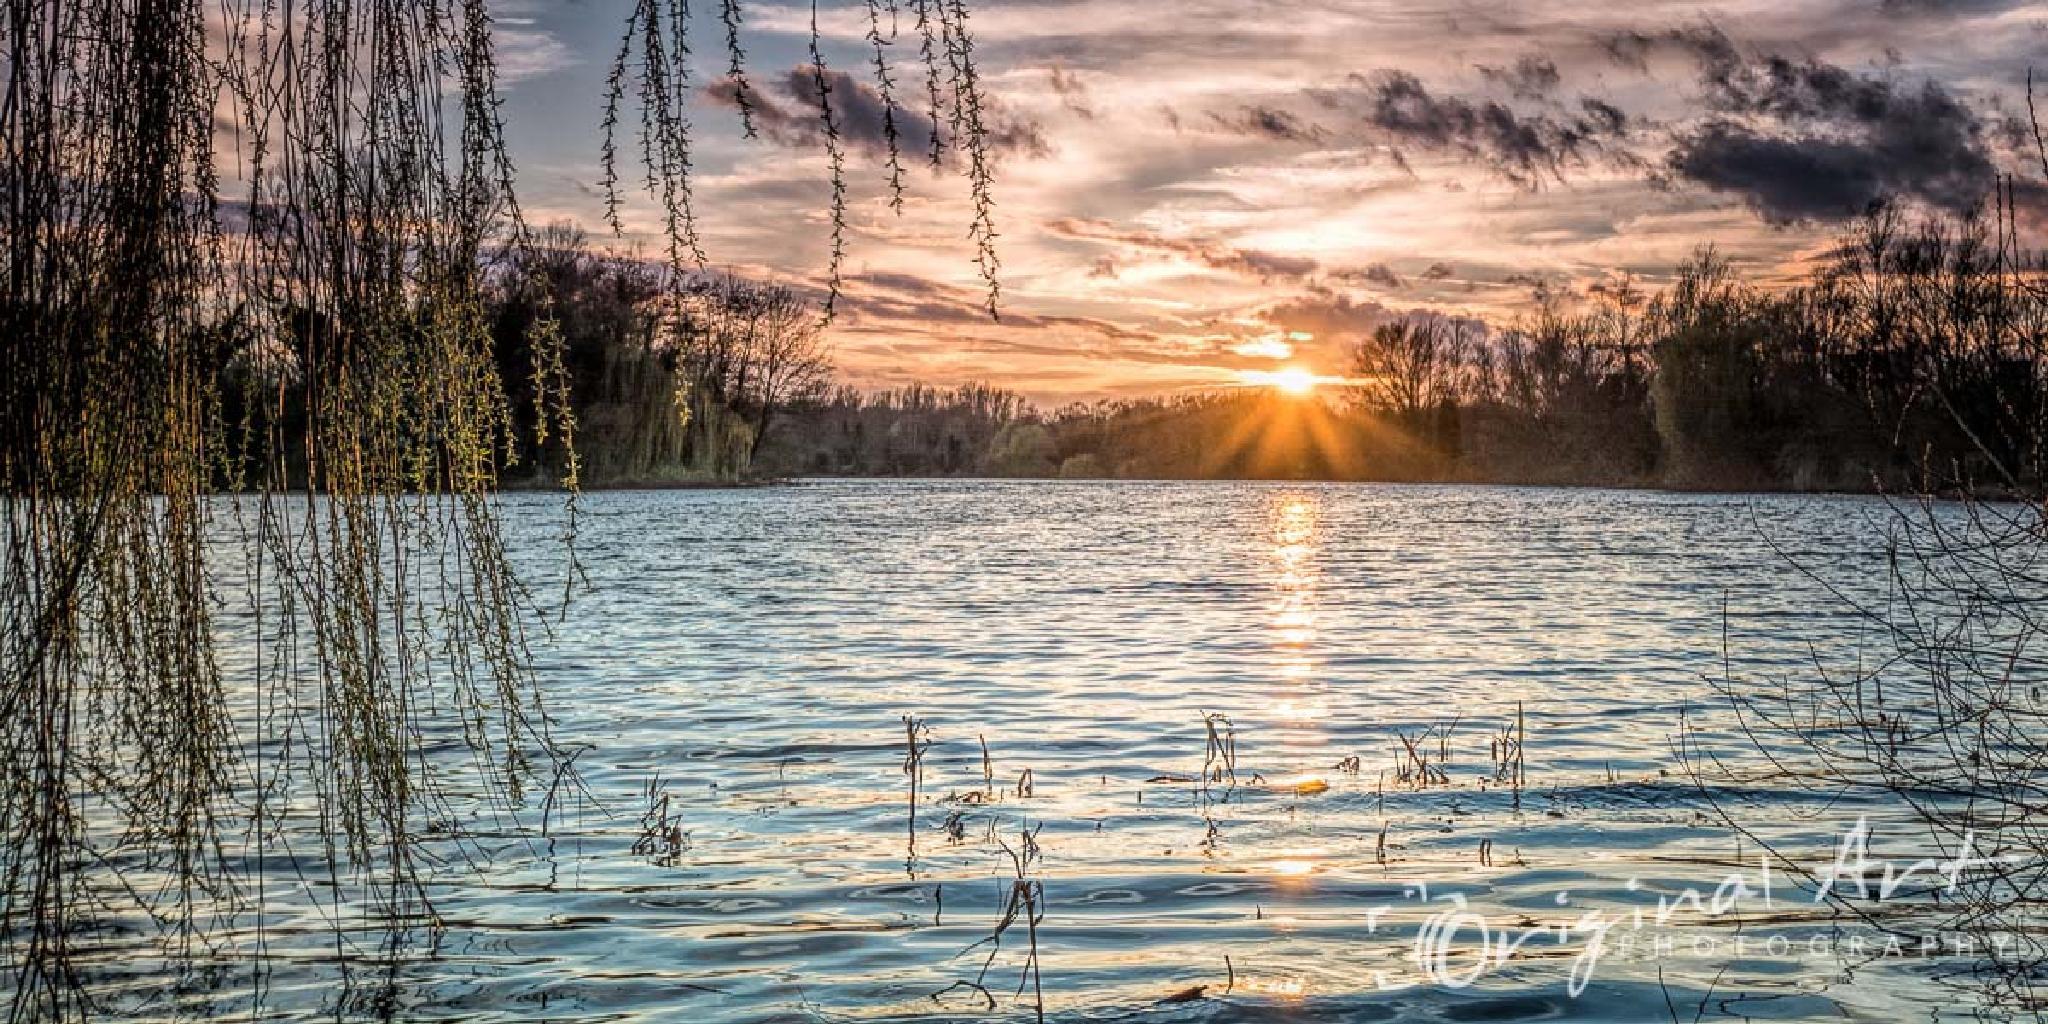 UEA Broad sunset by JoeLenton